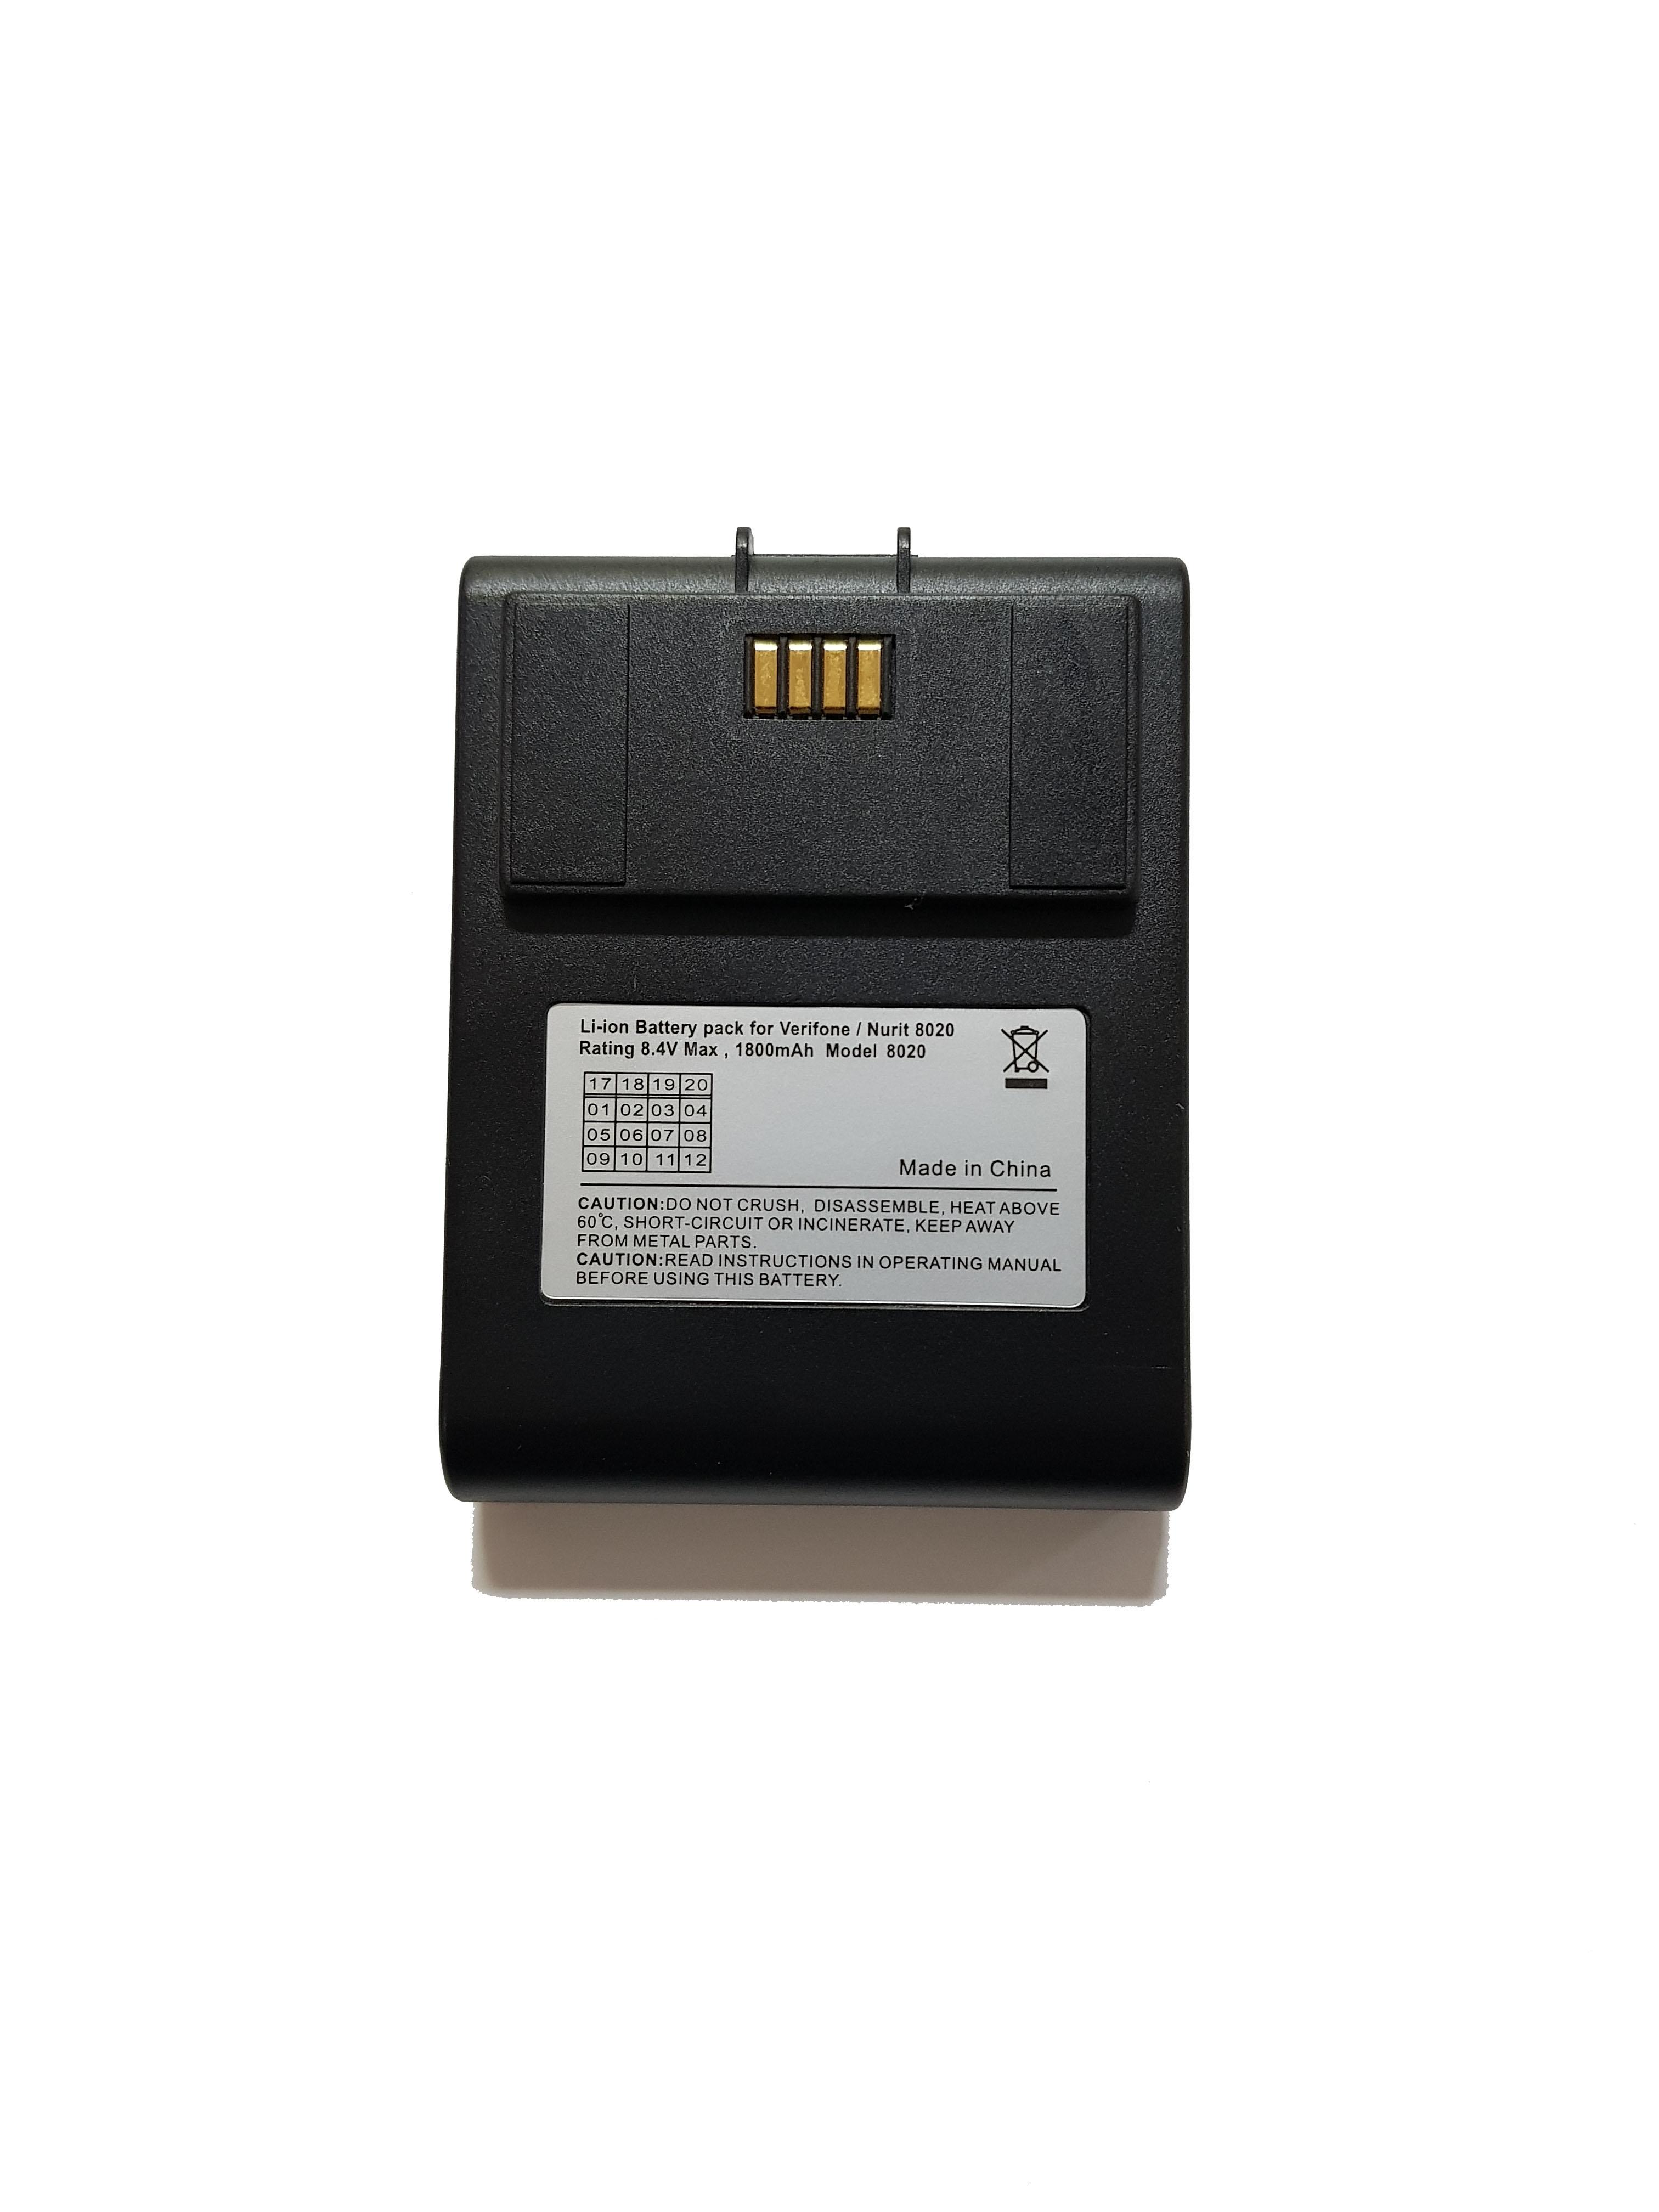 Bateria Externa 8020